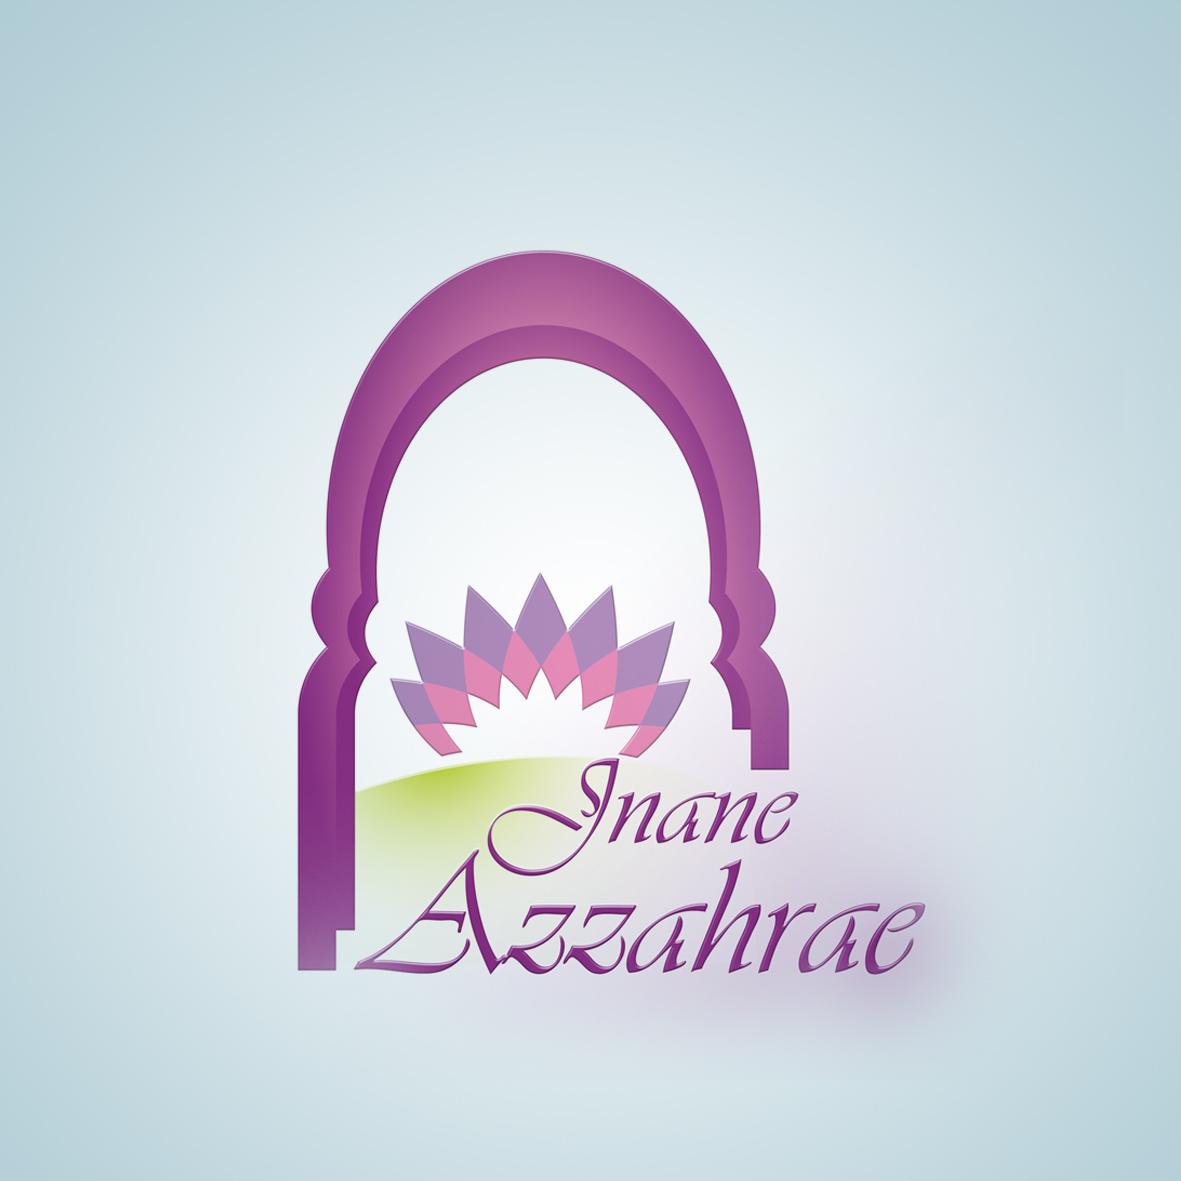 Logo Jnane azzahrae